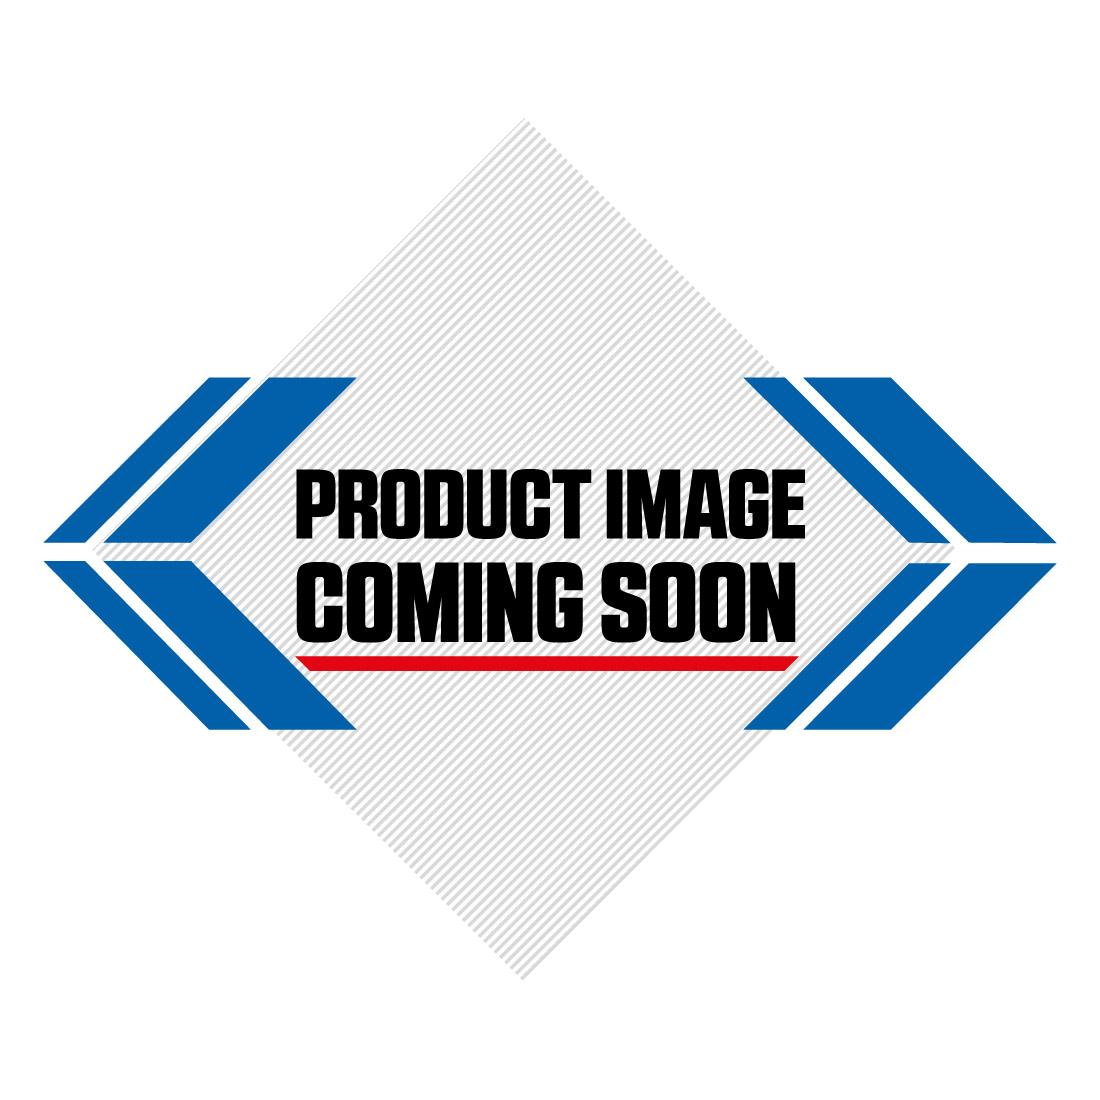 Suzuki Plastic Kit RMZ 250 (10-18) Black Image-5>